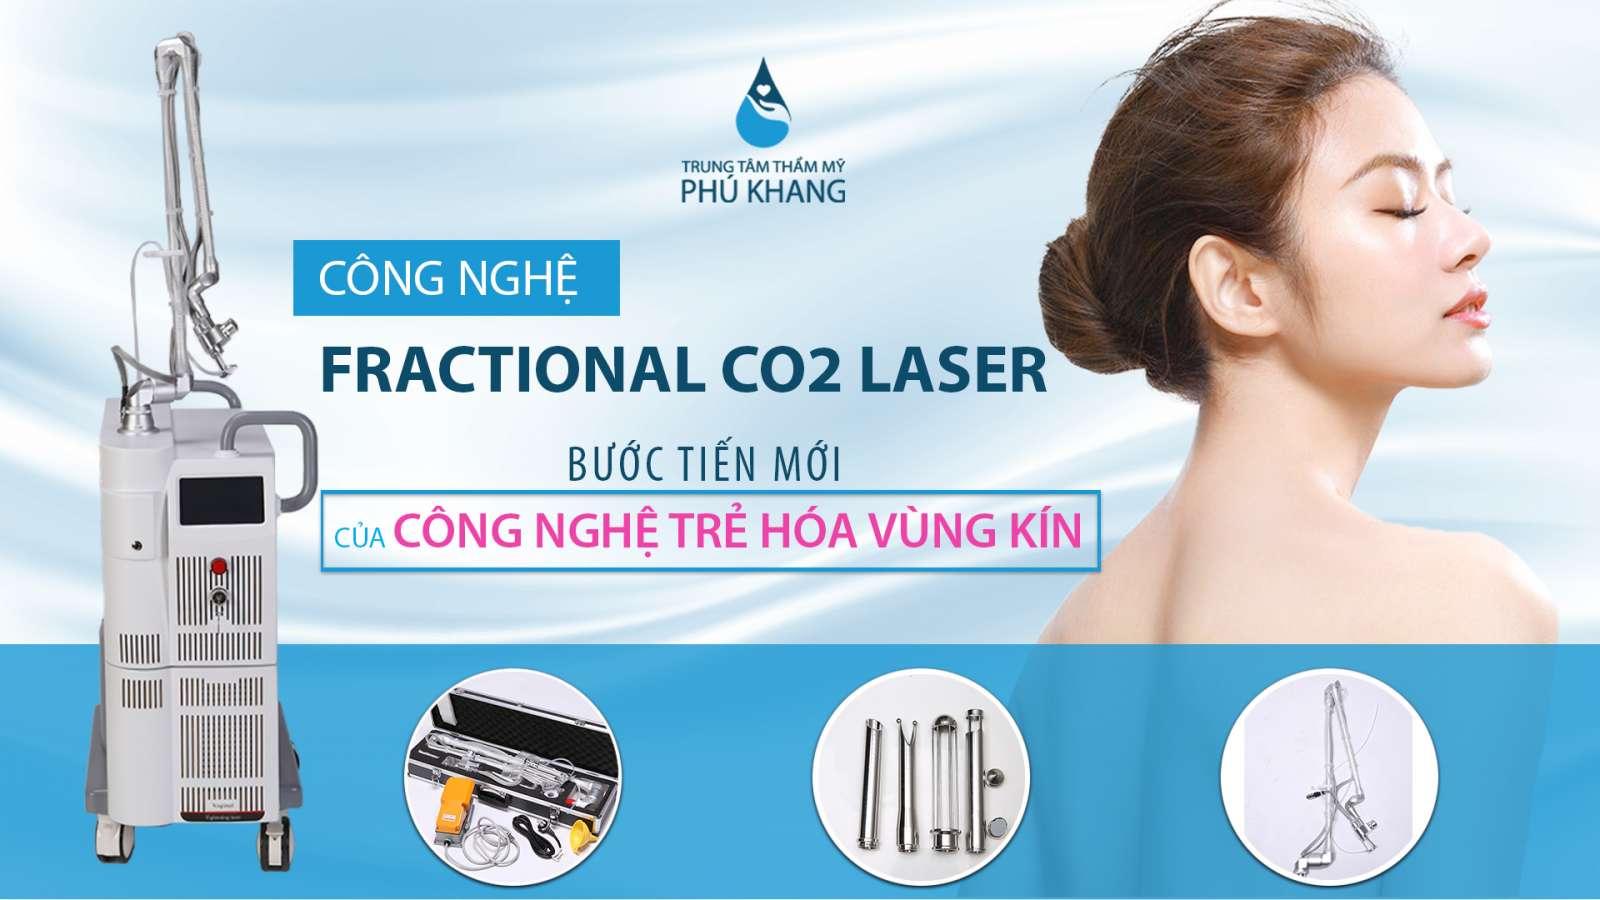 vi-sao-chon-phu-khang-thuc-hien-tre-hoa-vung-kin-bang-laser-fractional-co2